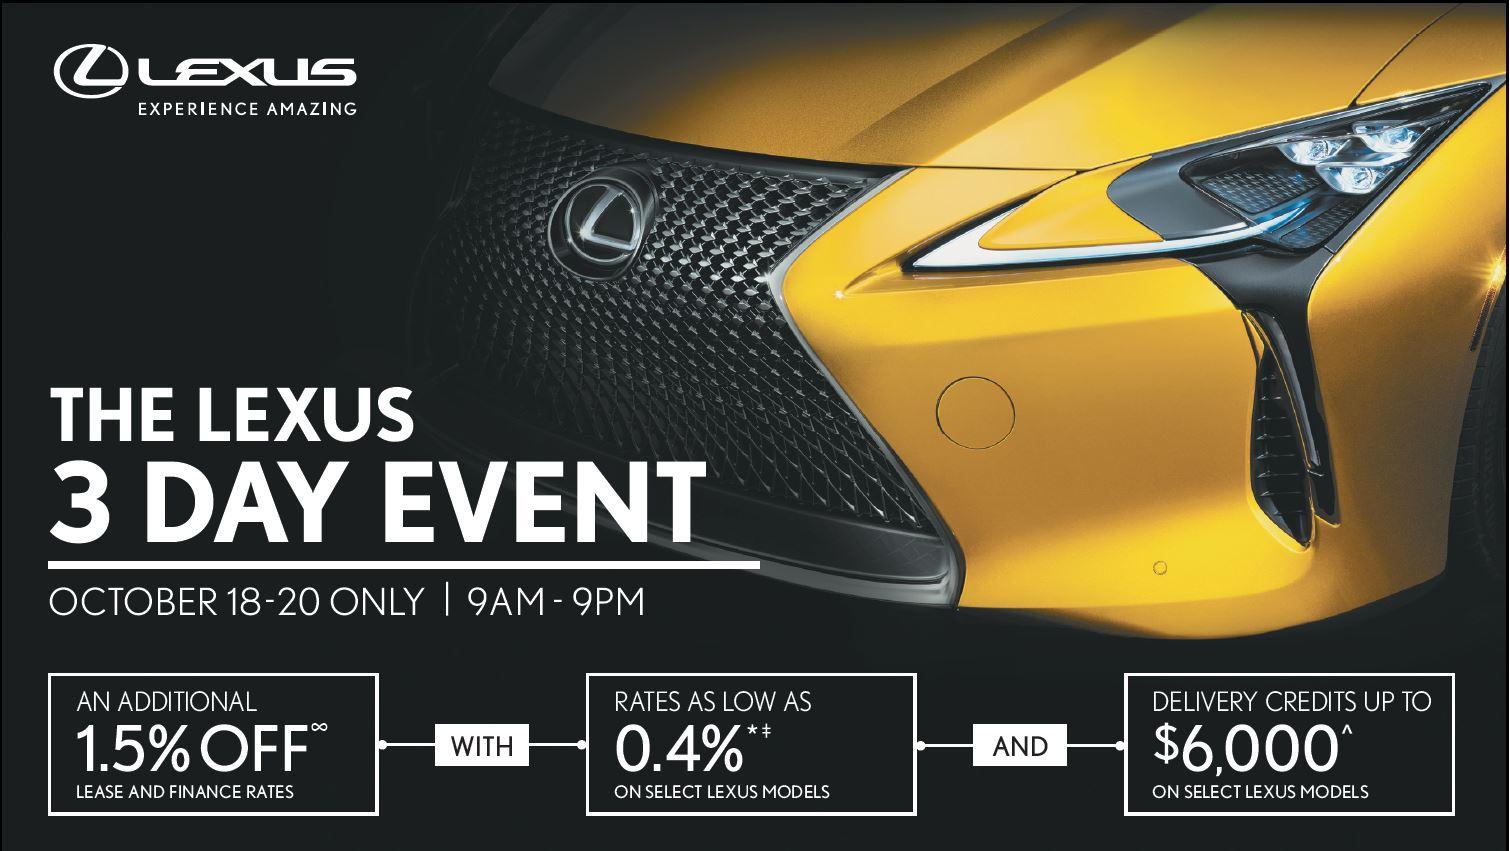 new-Lexus-Three-day-event-at-ken-shaw-lexus-toronto-ontario